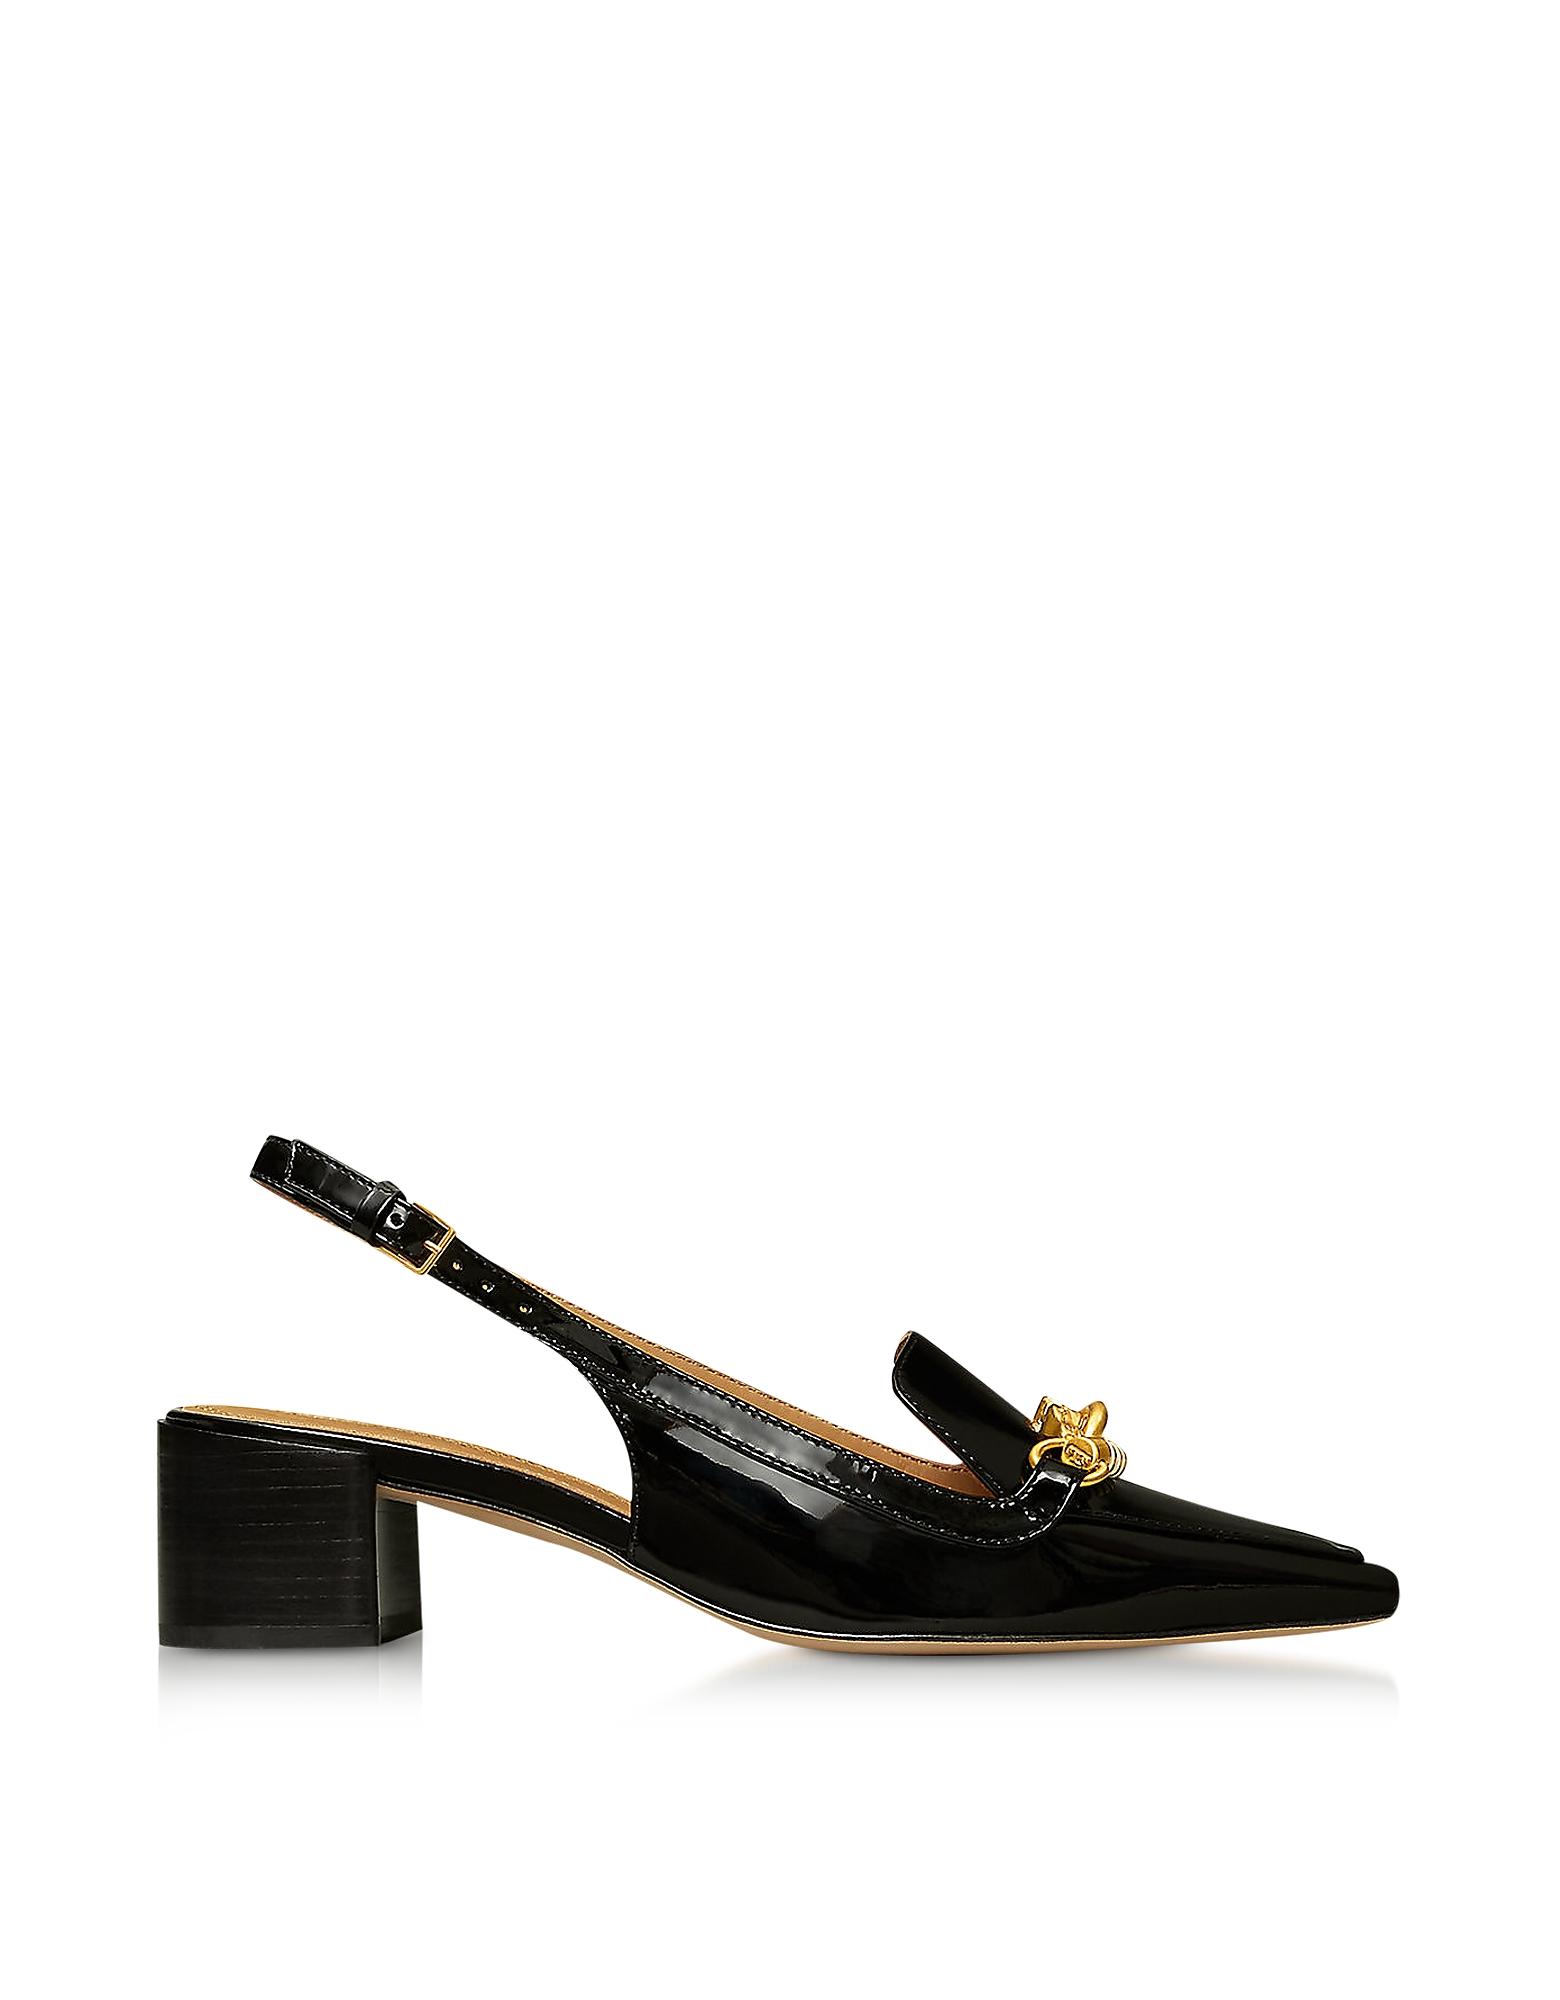 Tory Burch Designer Shoes, Jessa 45MM Perfect Black Slingback Pumps